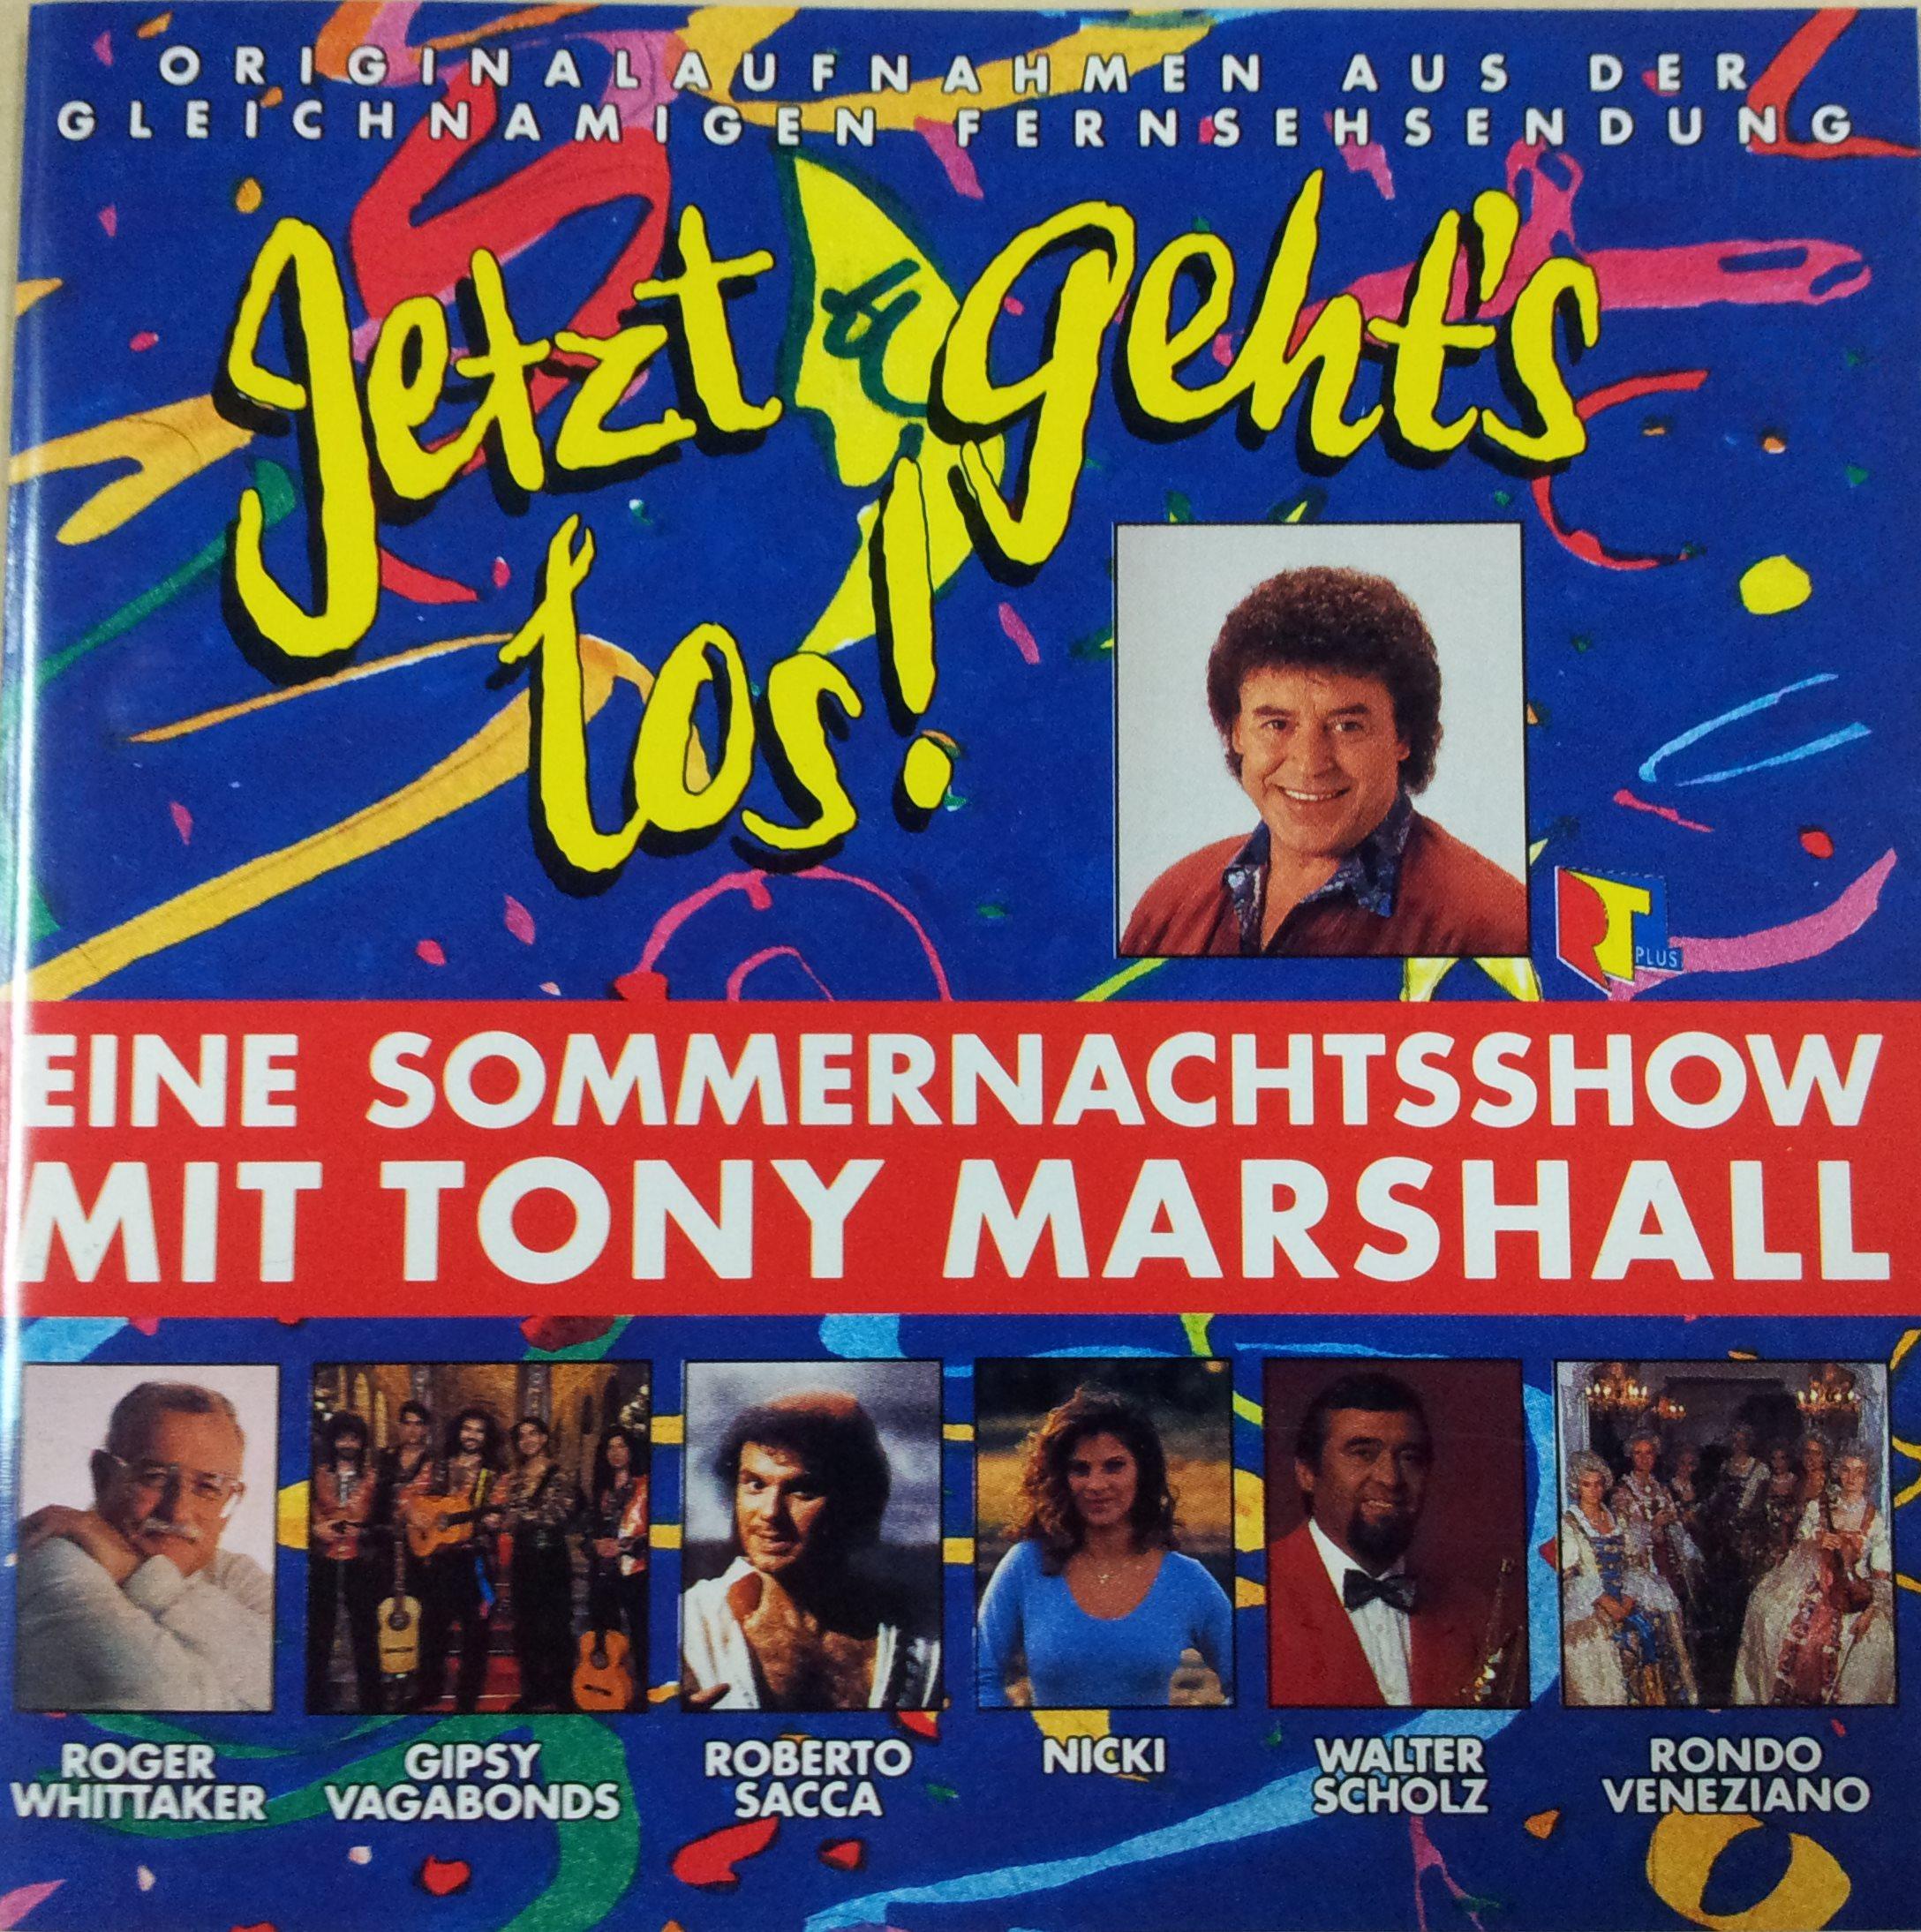 Jetzt geht's los - Eine Sommernachtsshow mit Tony Marshall